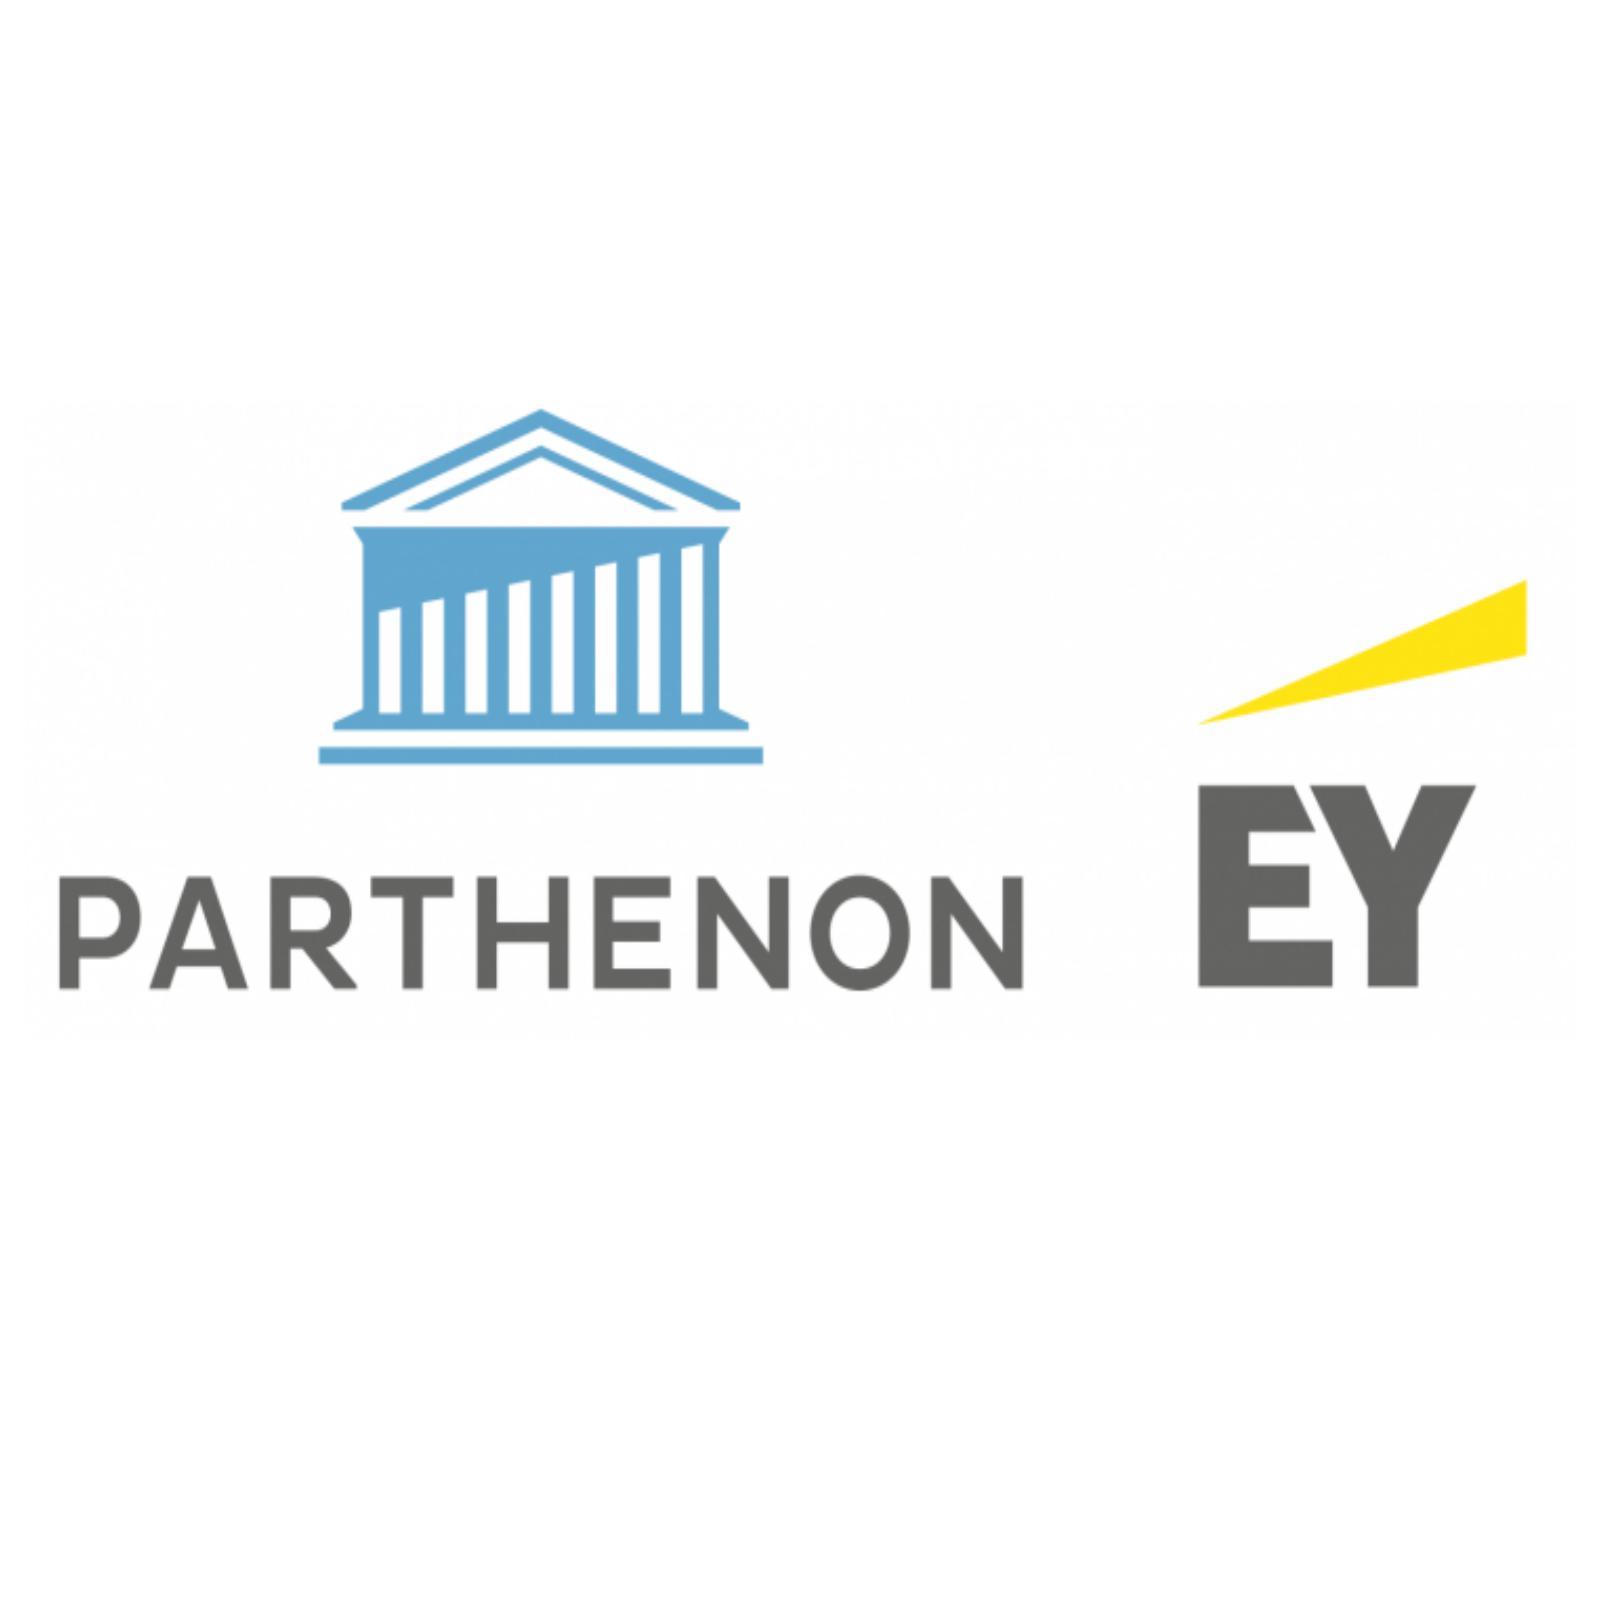 Parthenon-EY Education Forum on Higher Education @ USC